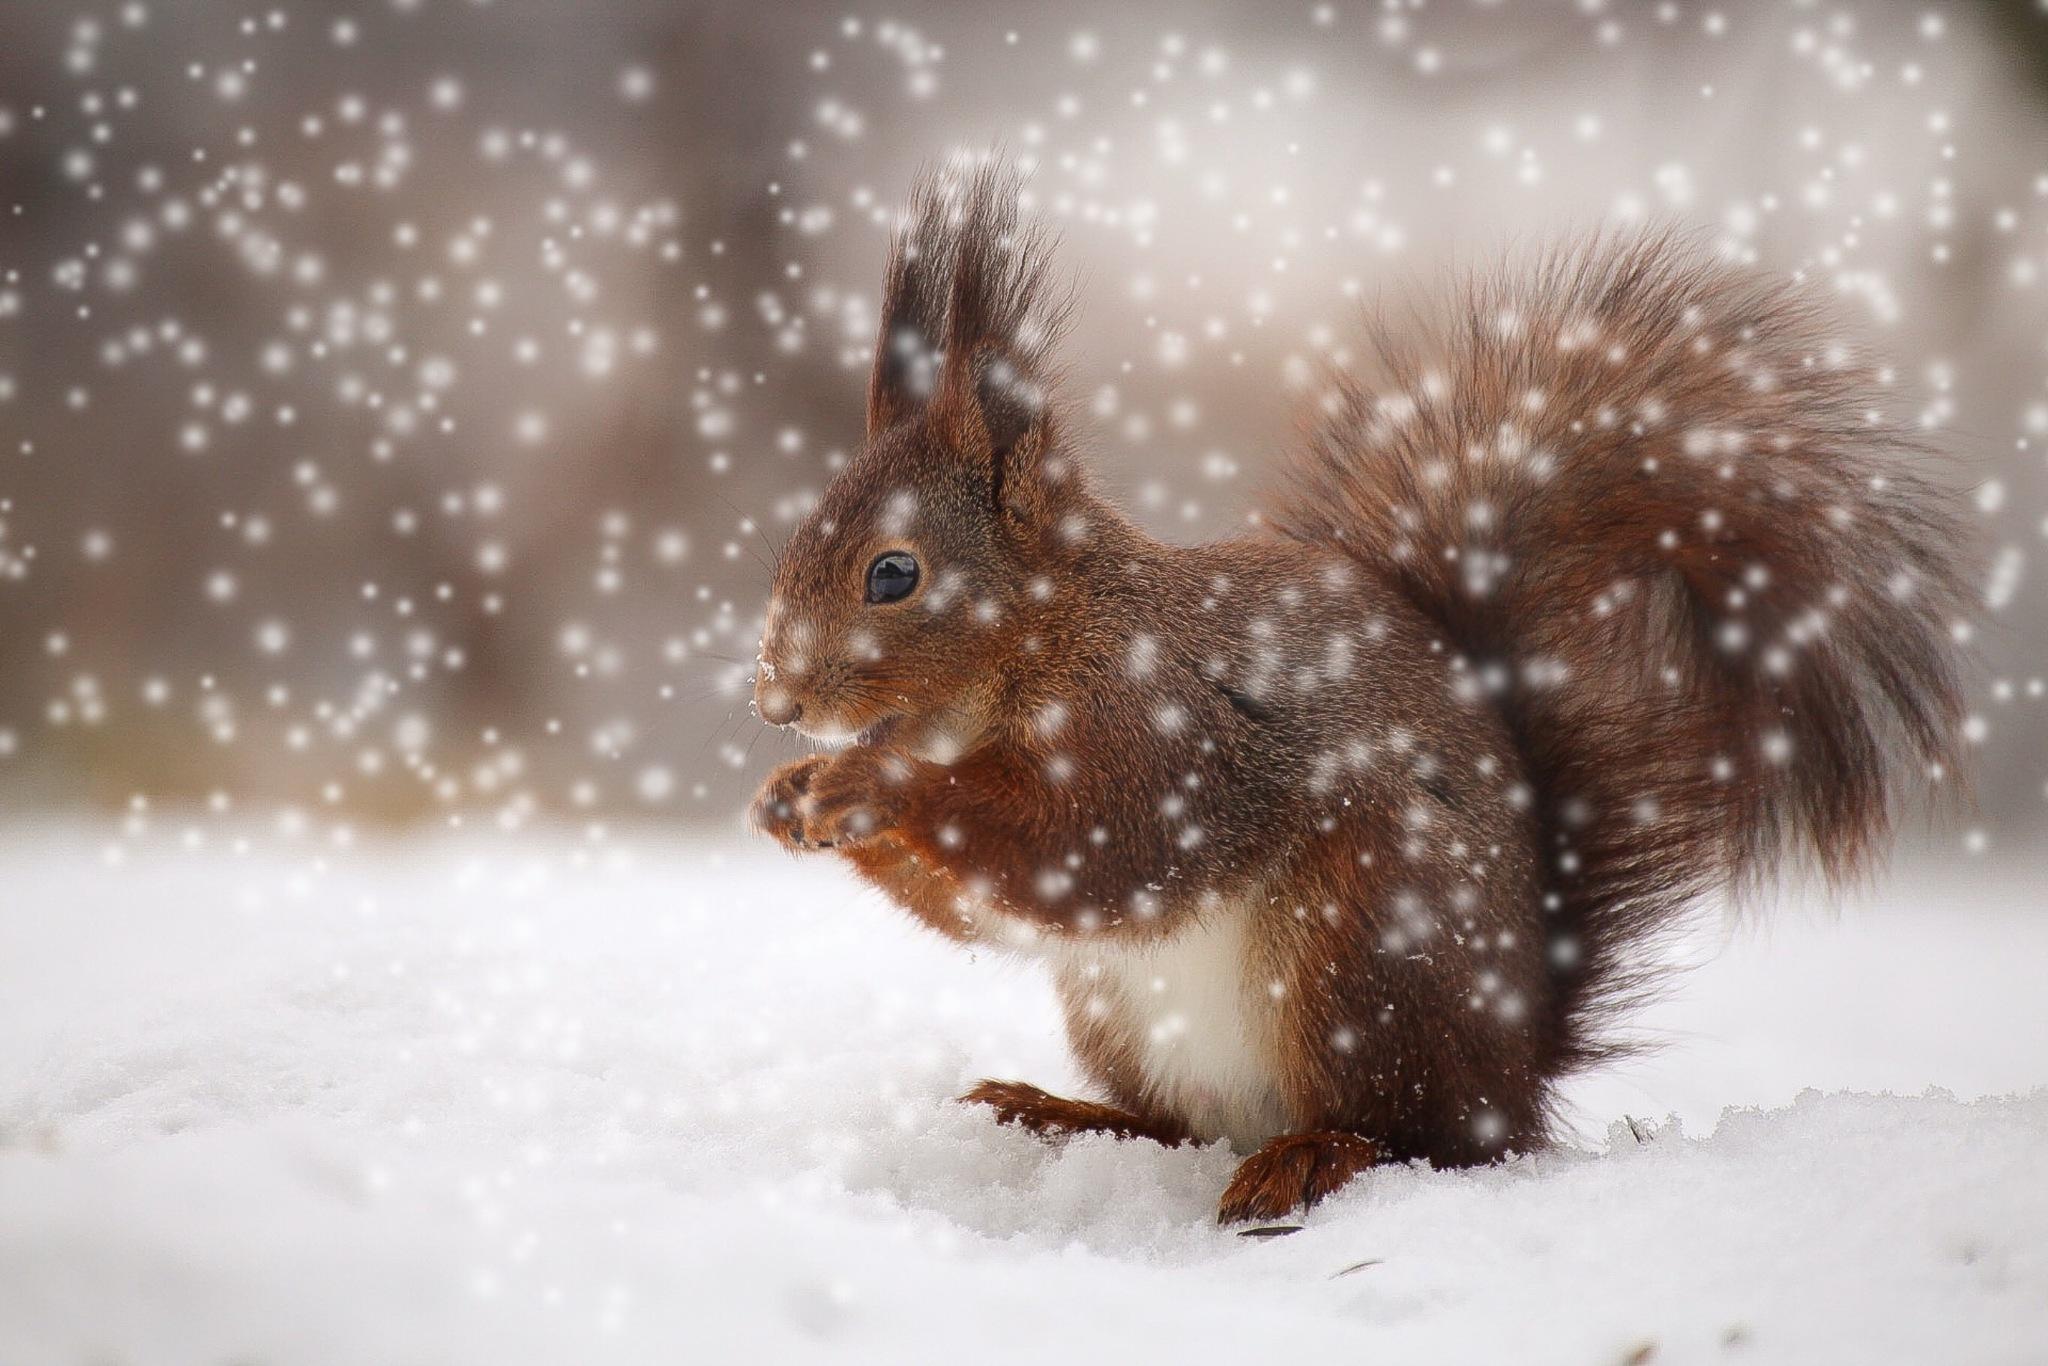 PicsArt squirrel  by Ingstina